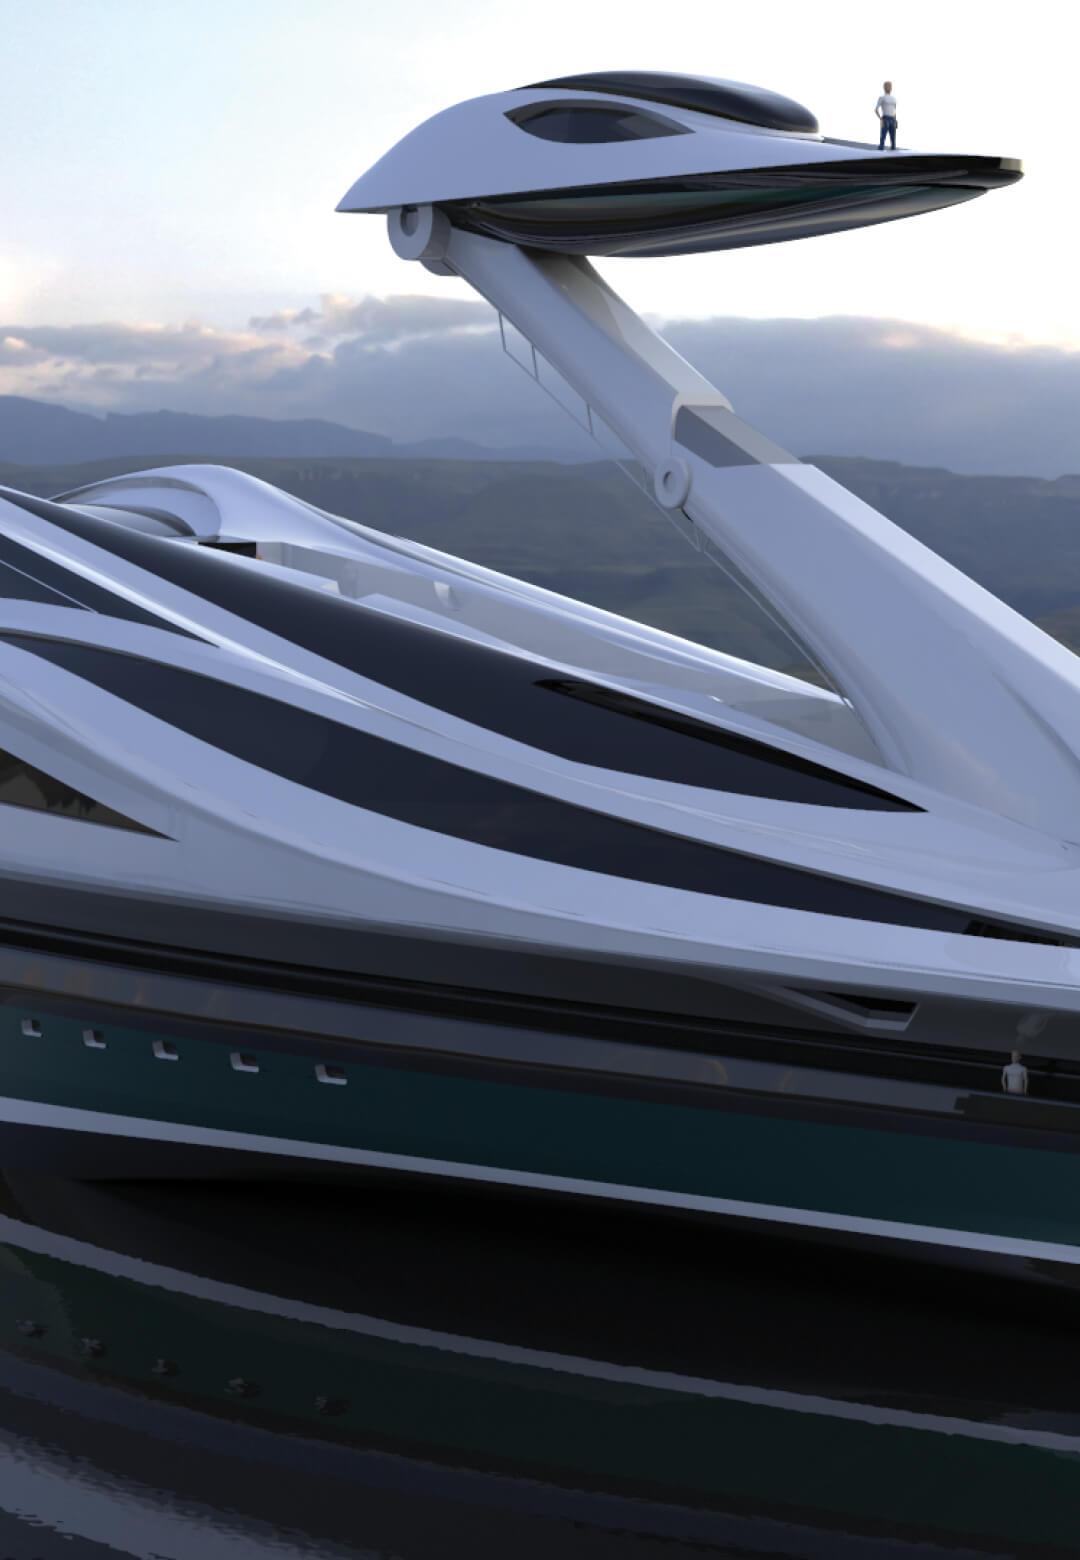 Avanguardia is a cutting-edge design for a 137-metre mega yacht   Avanguardia by Lazzarini Design Studio   STIRworld